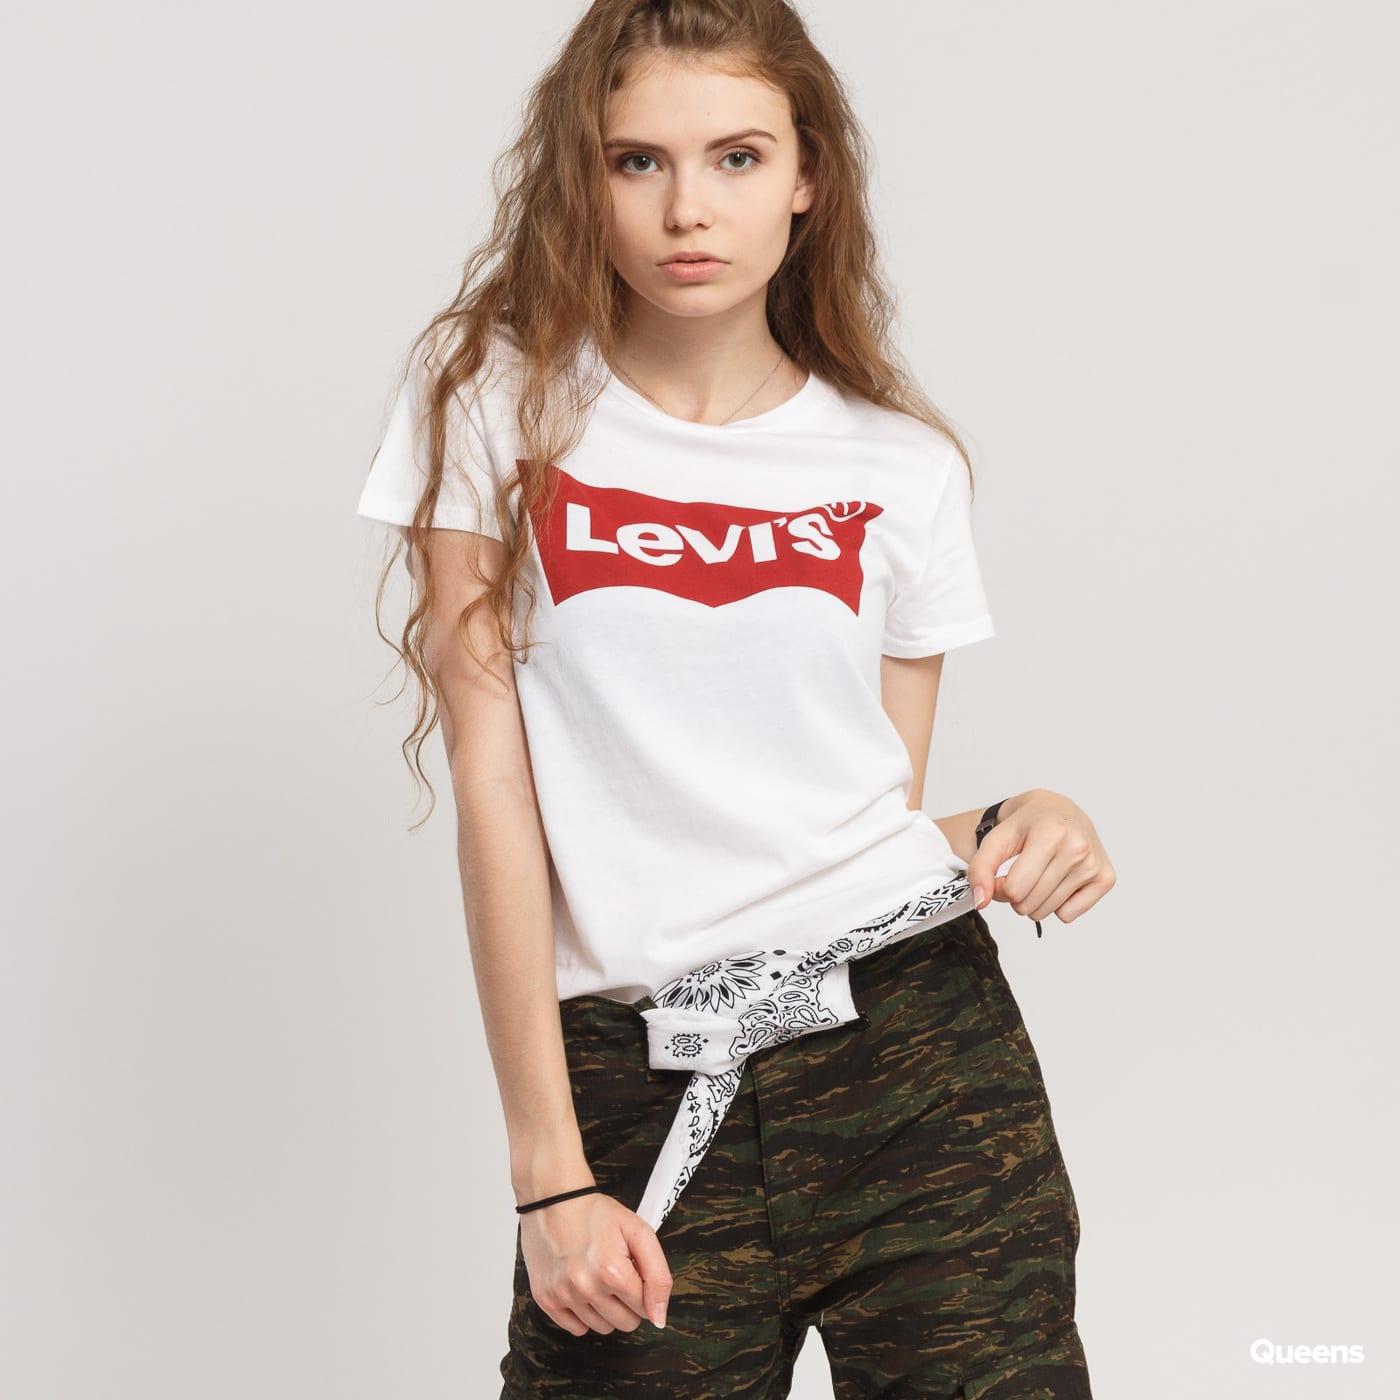 Dámské tričko Levi s ® The Perfect Tee (17369-0053) – Queens 💚 4290c54aed